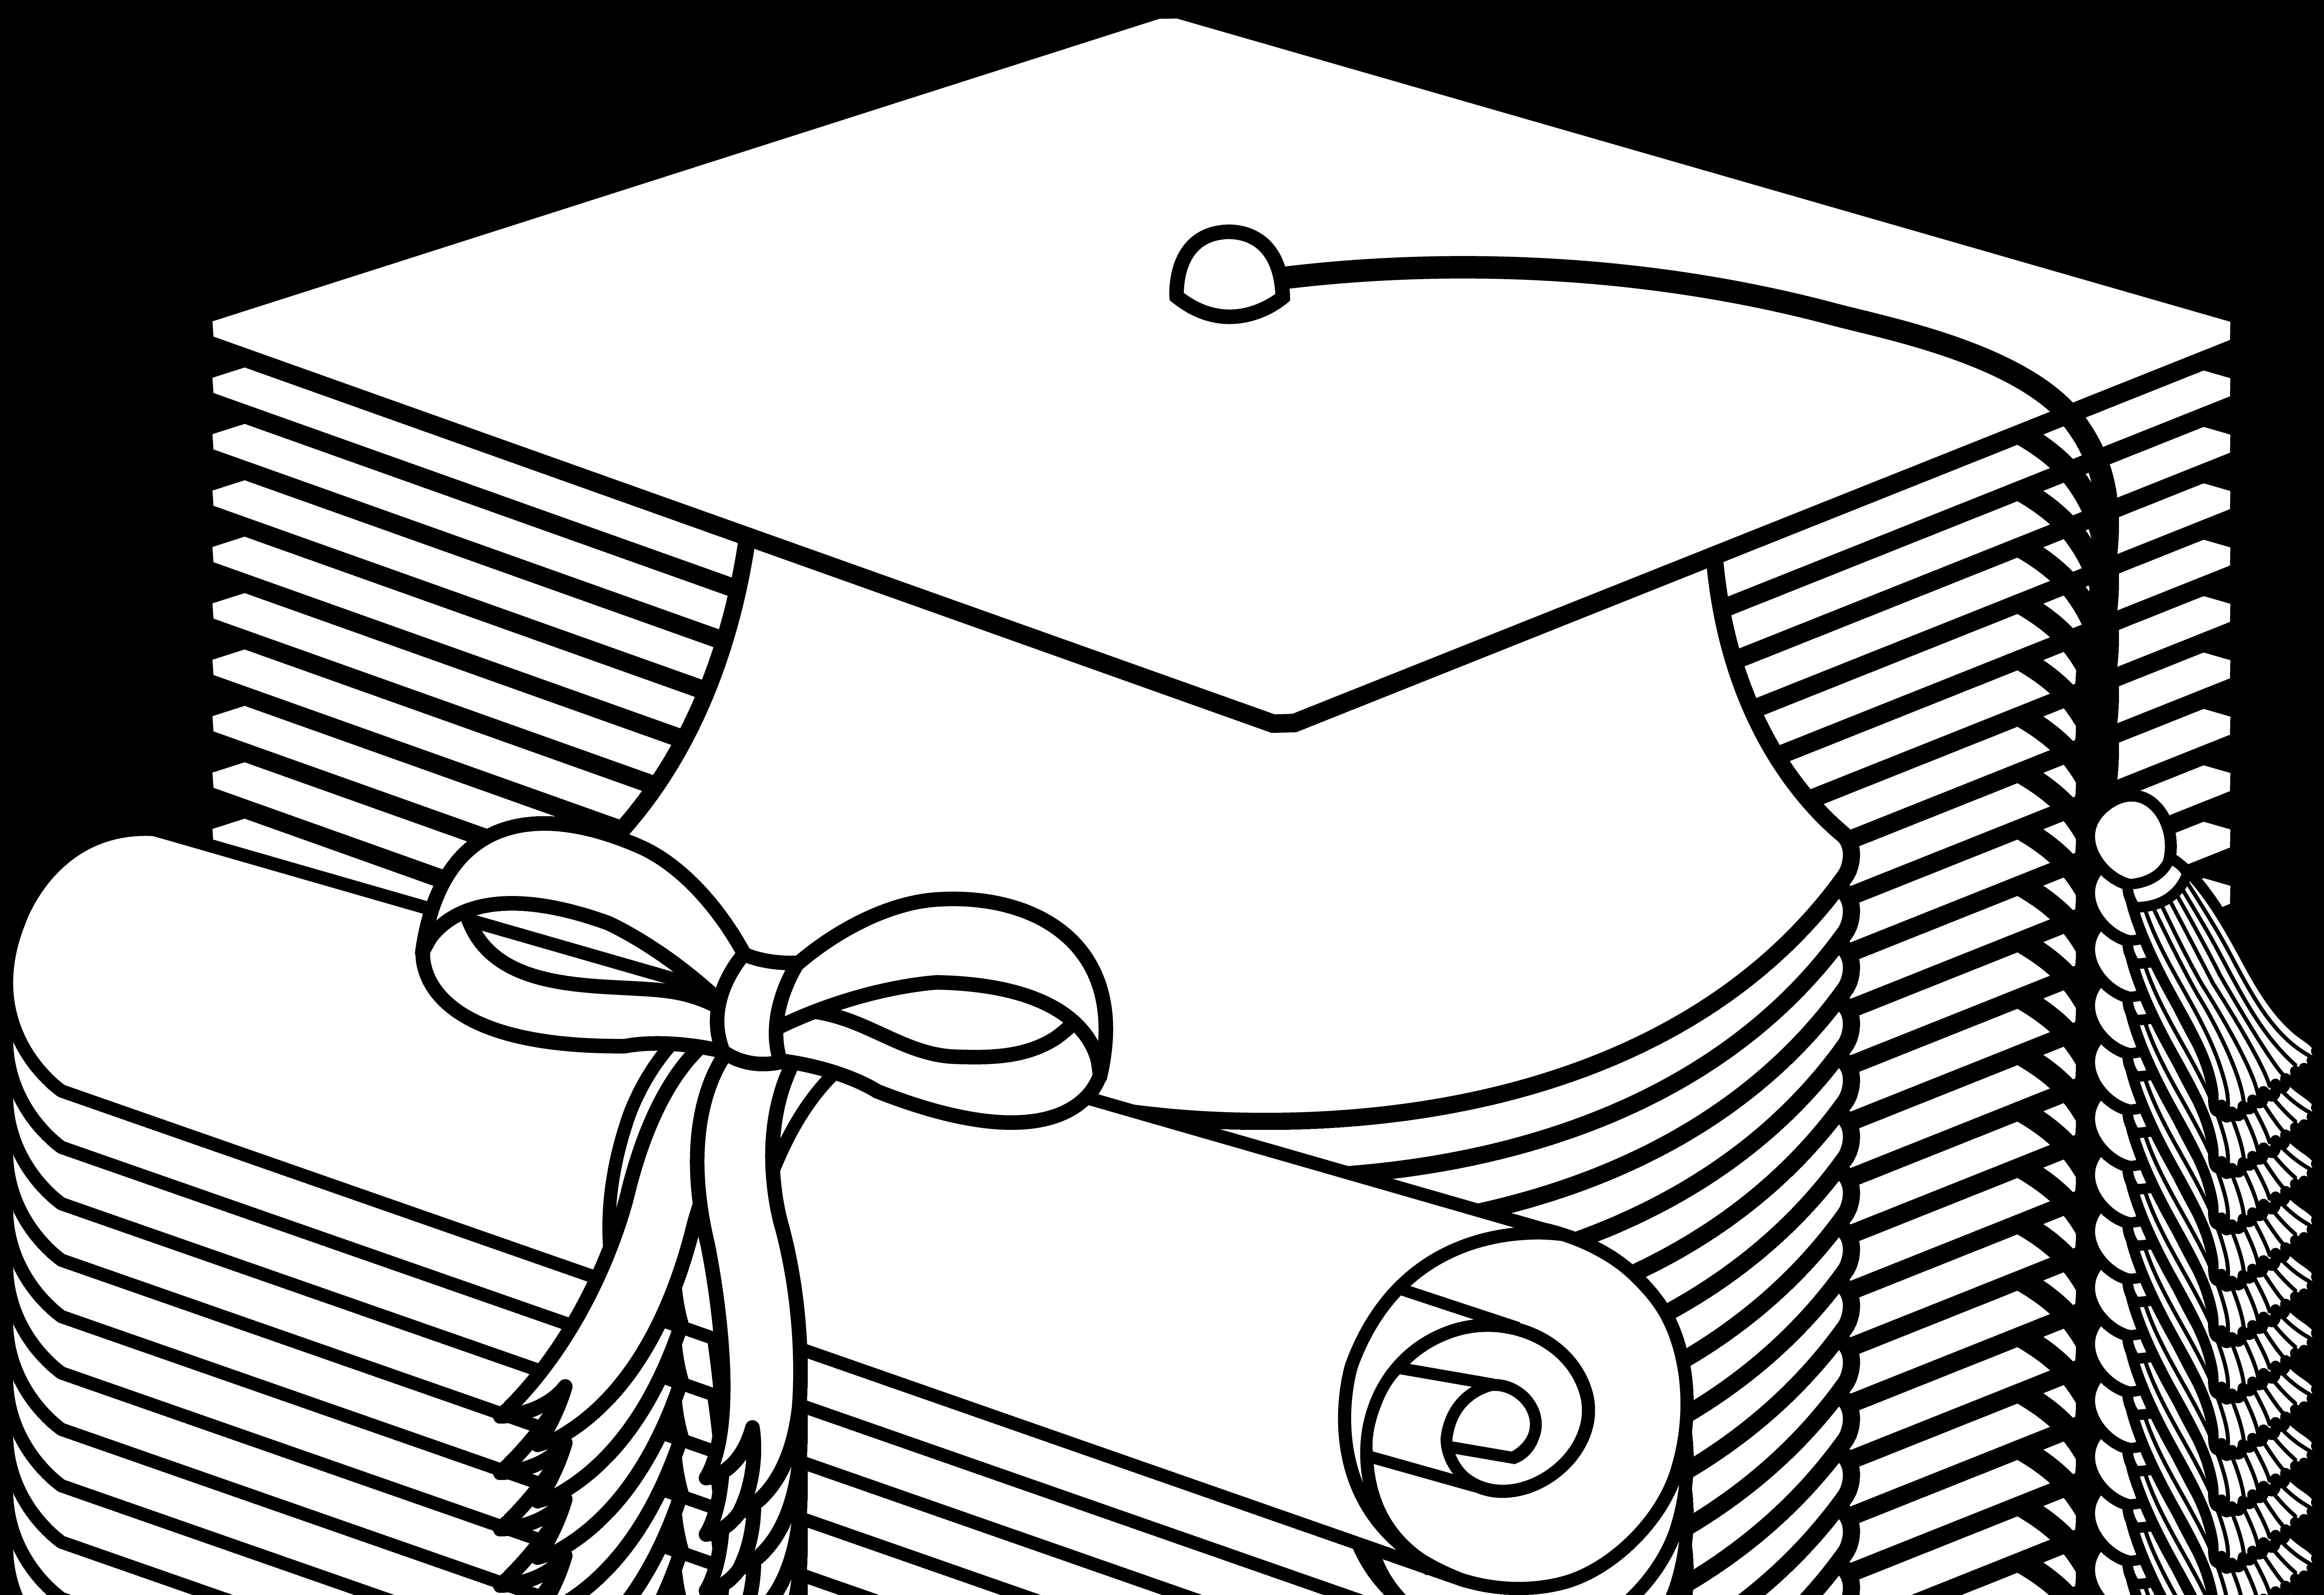 Cap And Diploma Clipart ...-Cap and diploma clipart ...-1